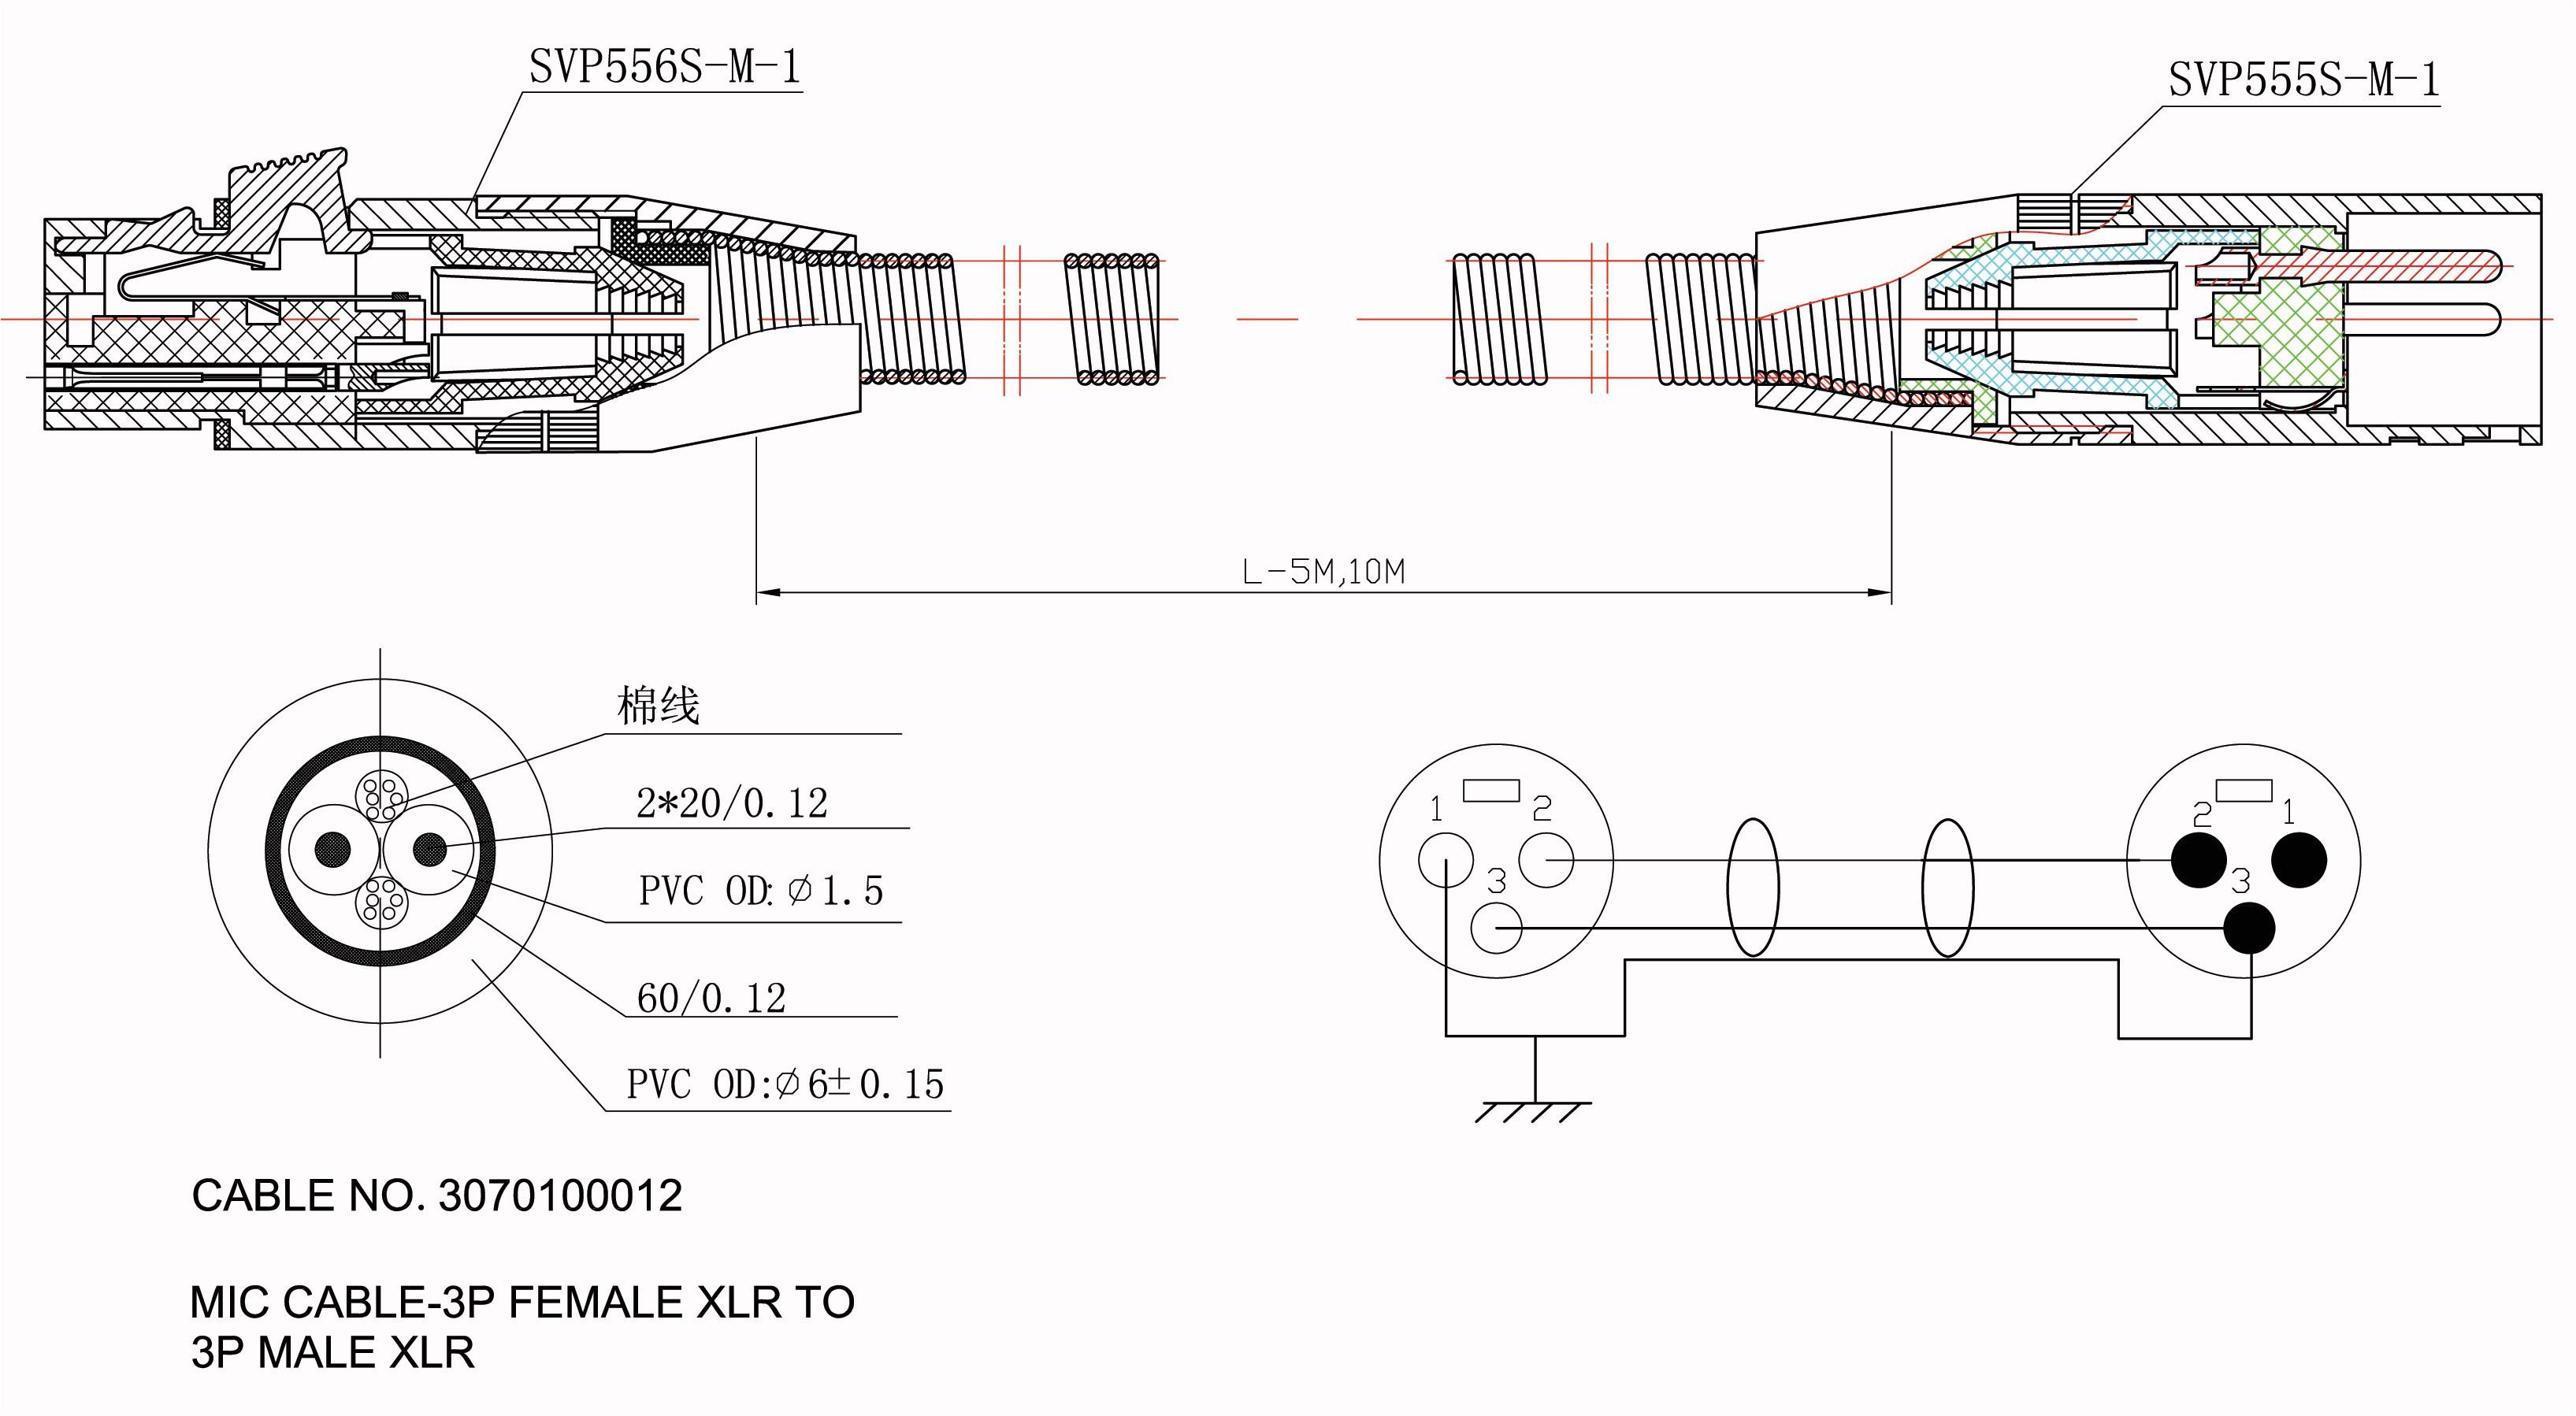 hella 550 wiring diagram best of free download js1000 wiring diagram wiring diagram amp fuse